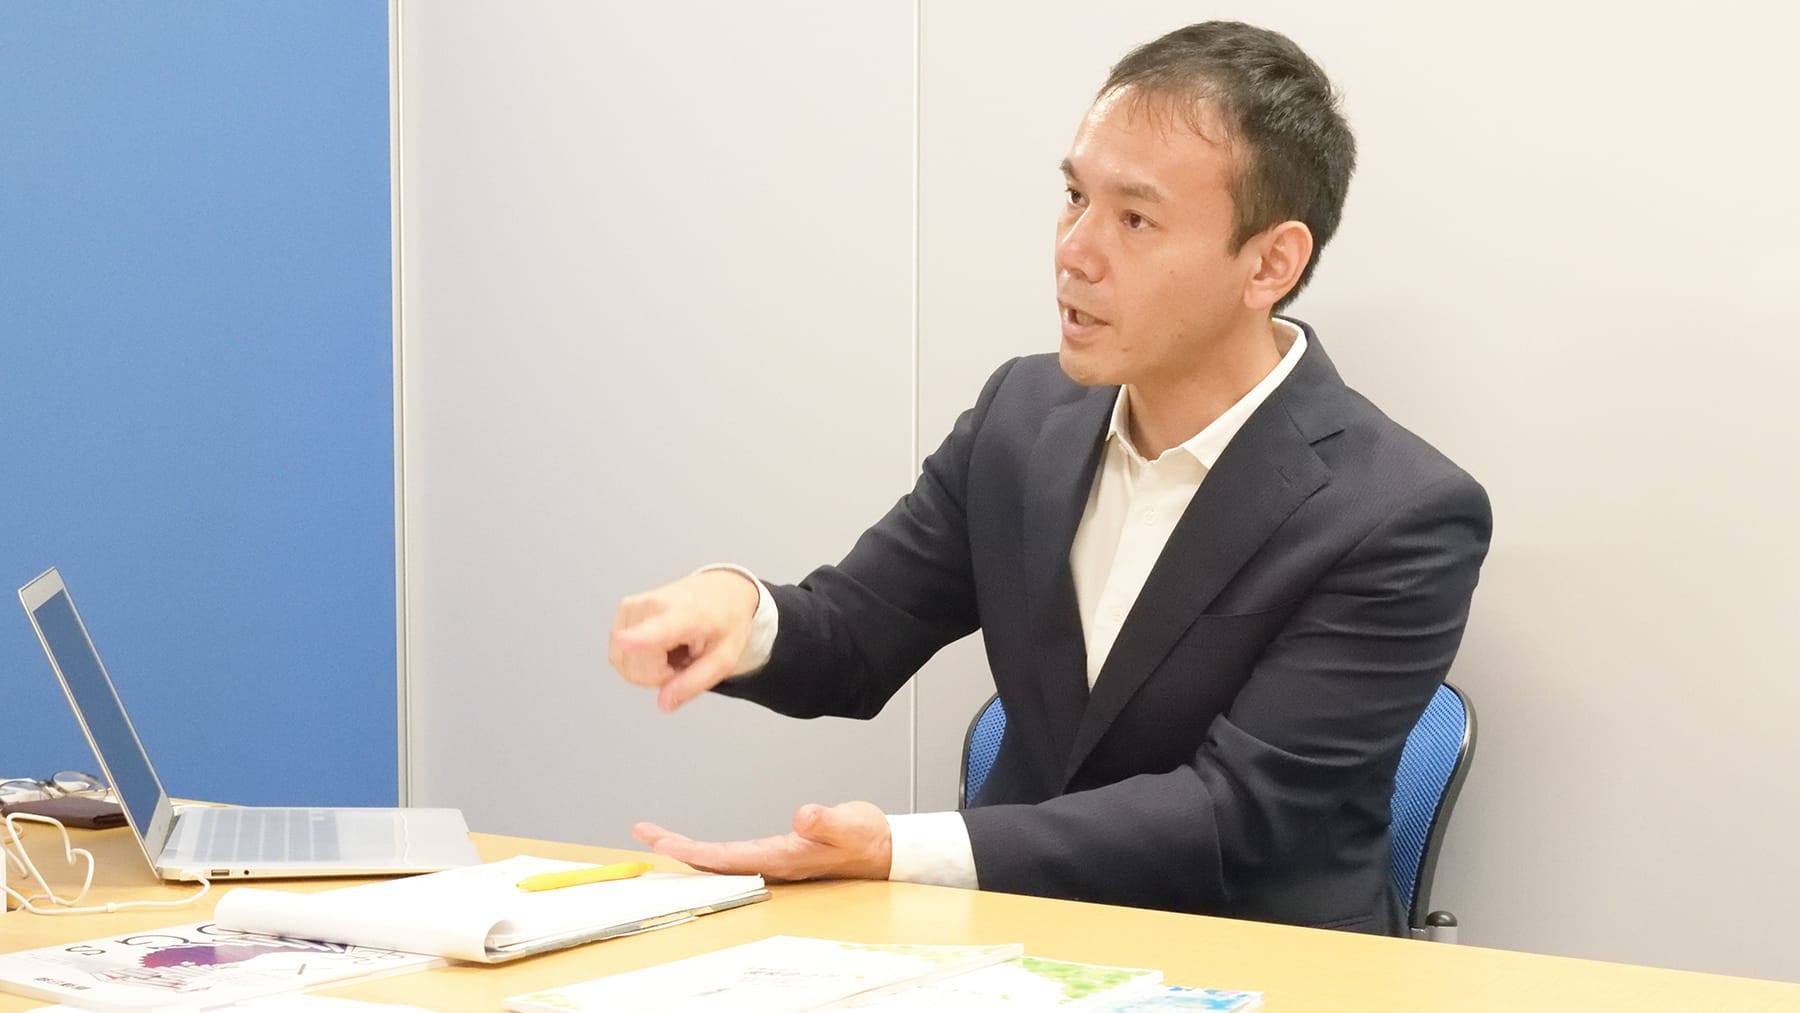 thumnail:株式会社トモノカイさまの事例取材風景